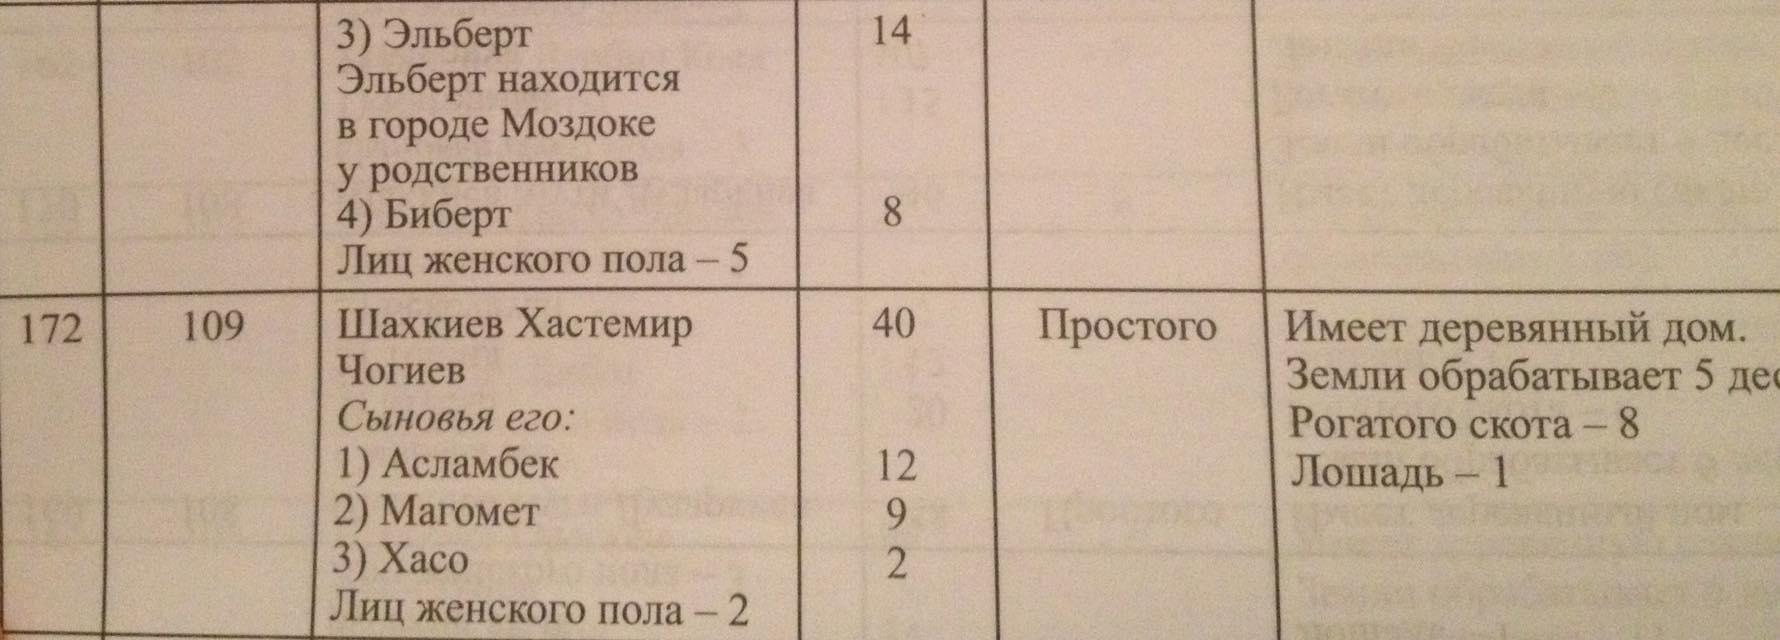 http://s6.uploads.ru/uigNA.jpg